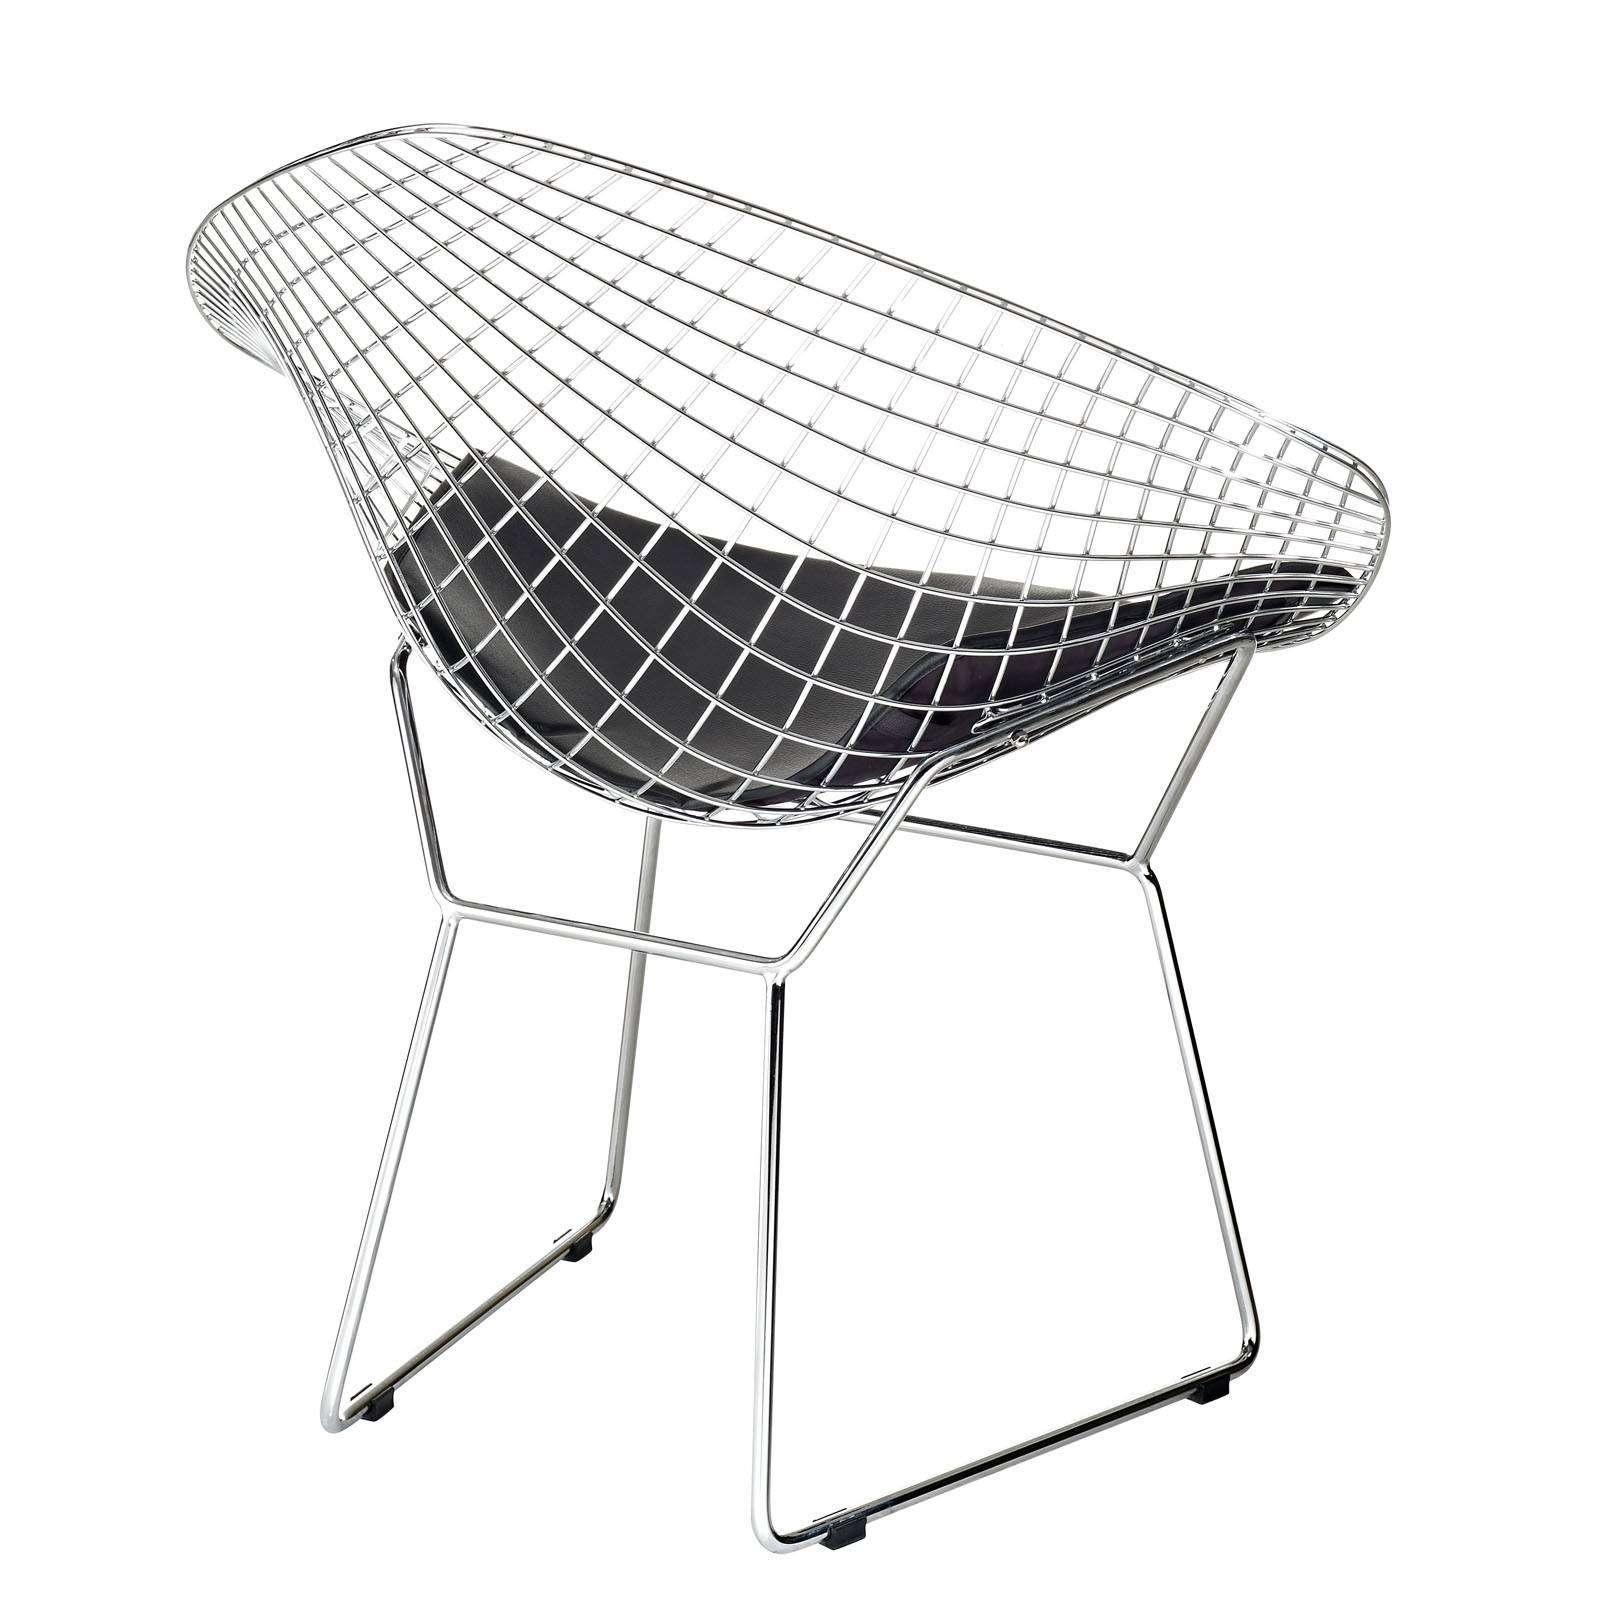 diamond chair replica cushions with ties uk bertoia style wire